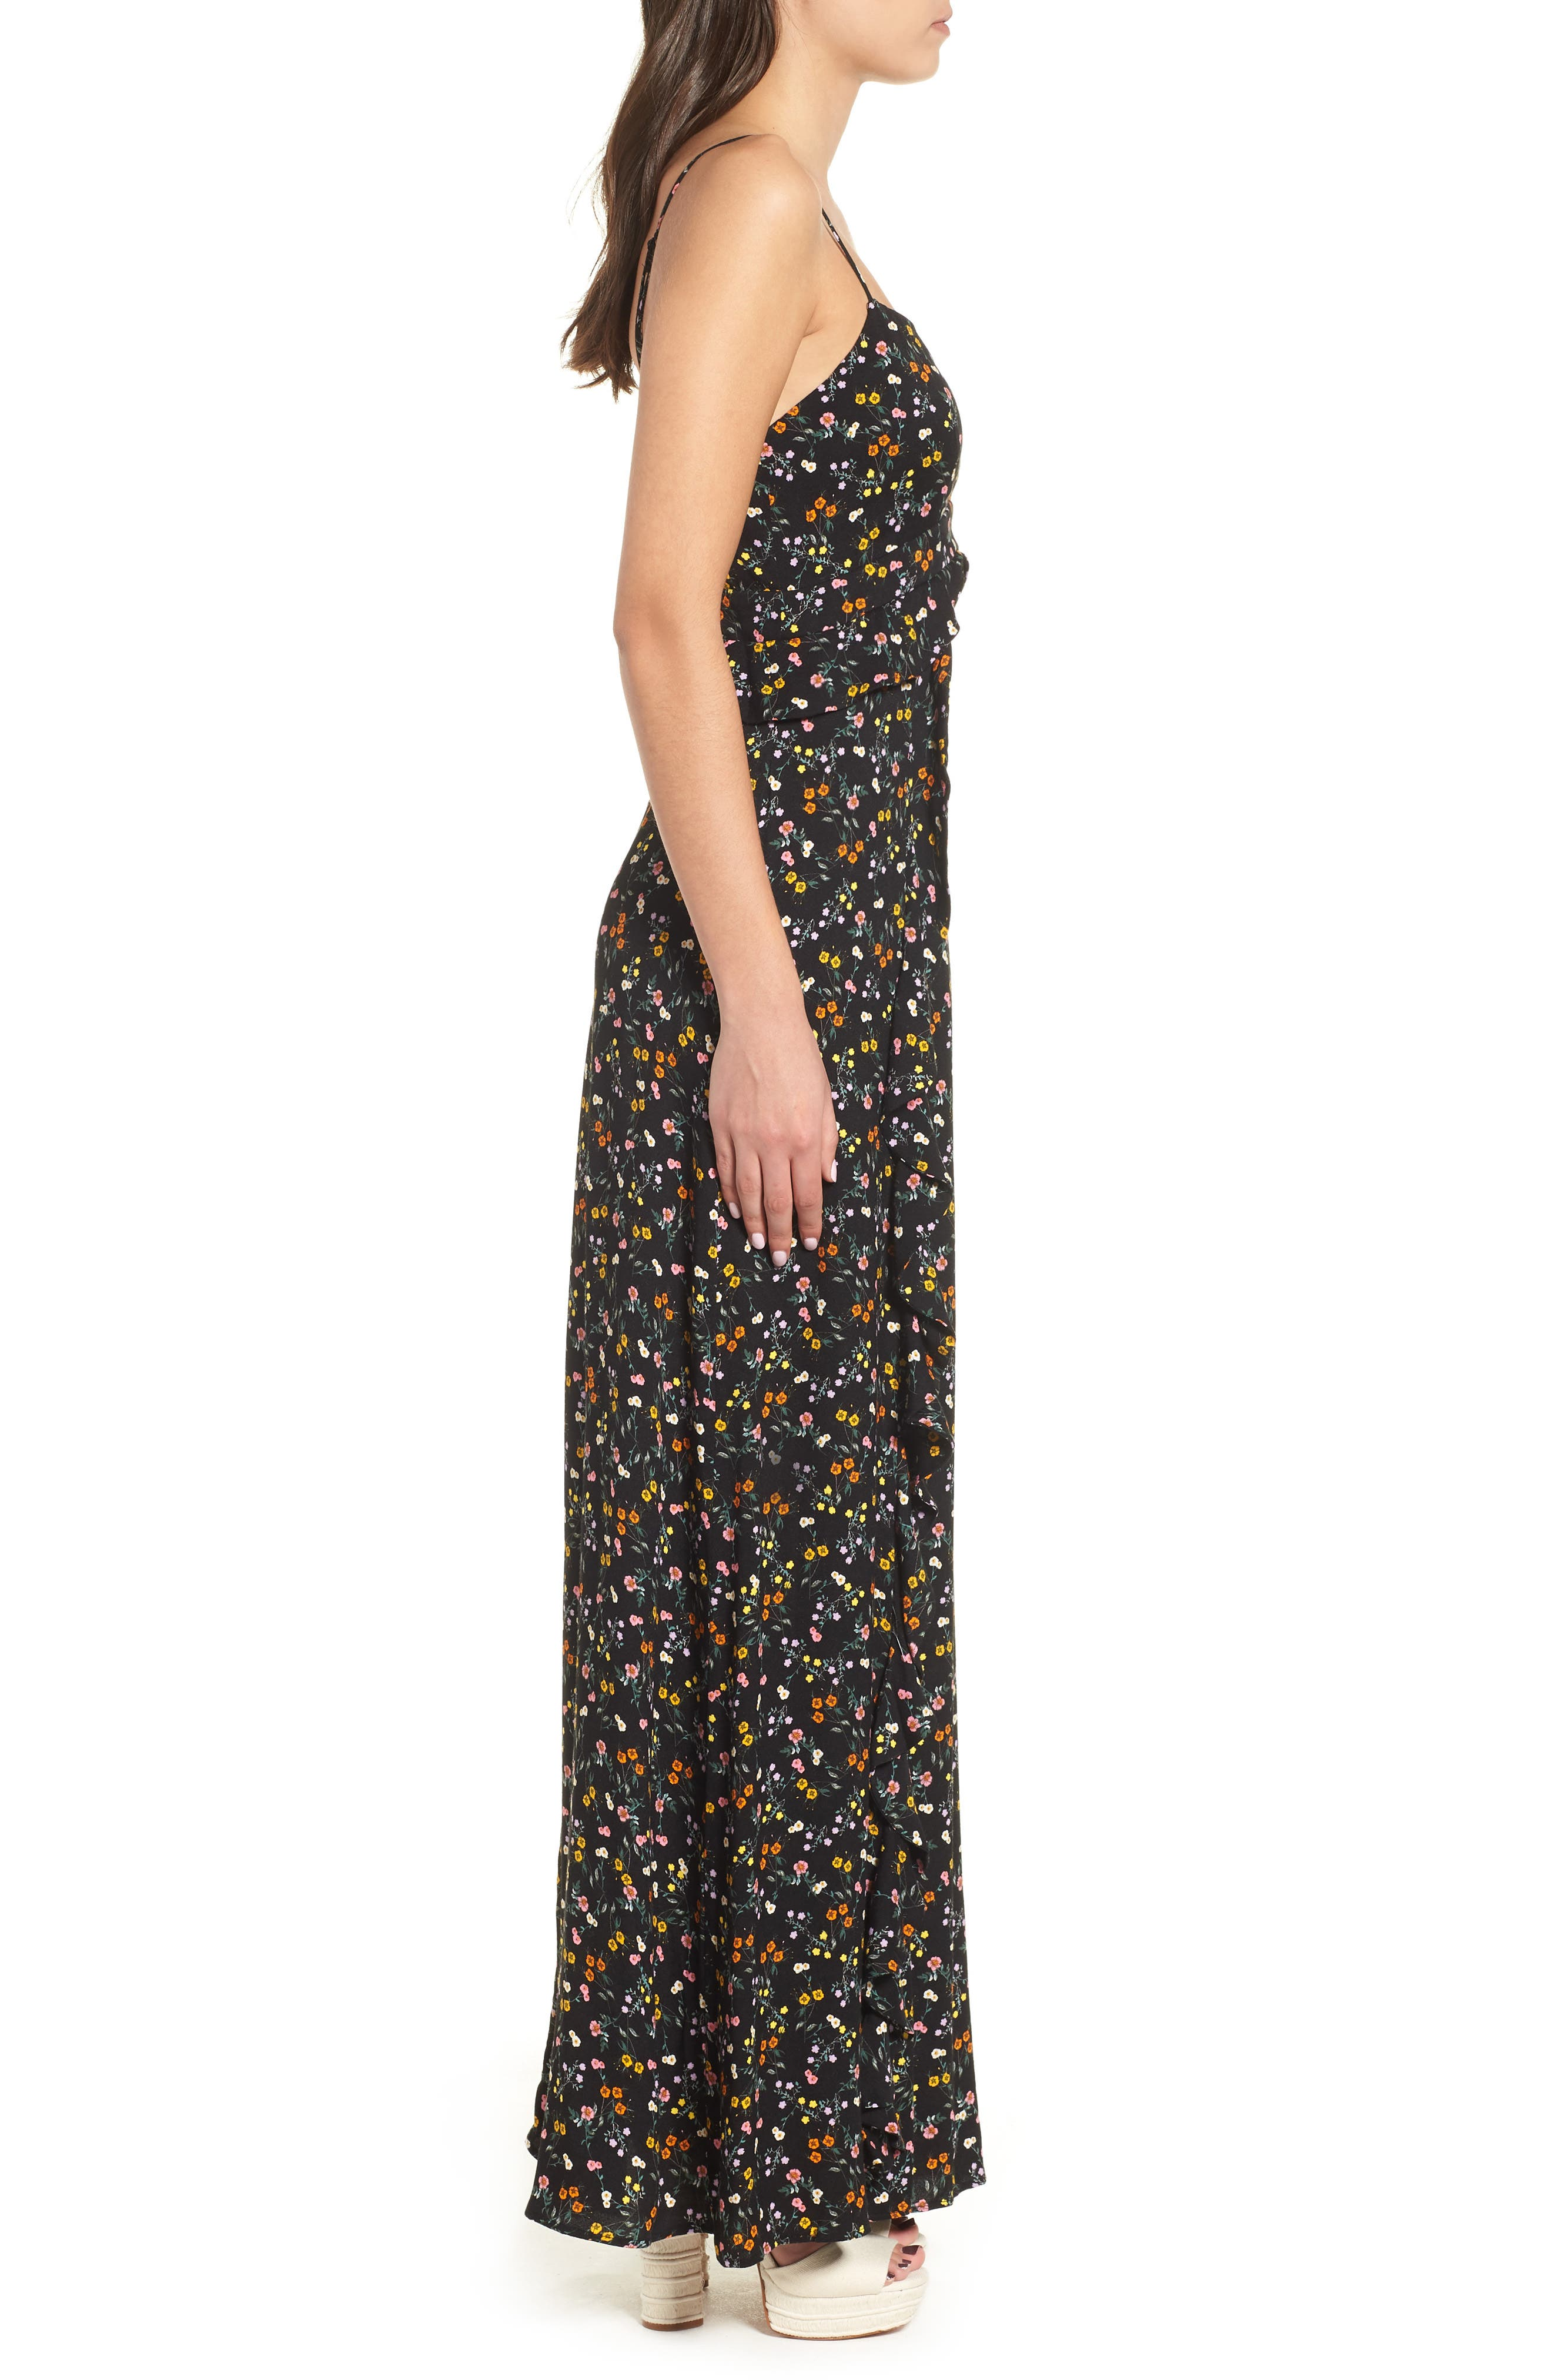 Kiki Ruffle Maxi Dress,                             Alternate thumbnail 3, color,                             Noir Petite Fleur